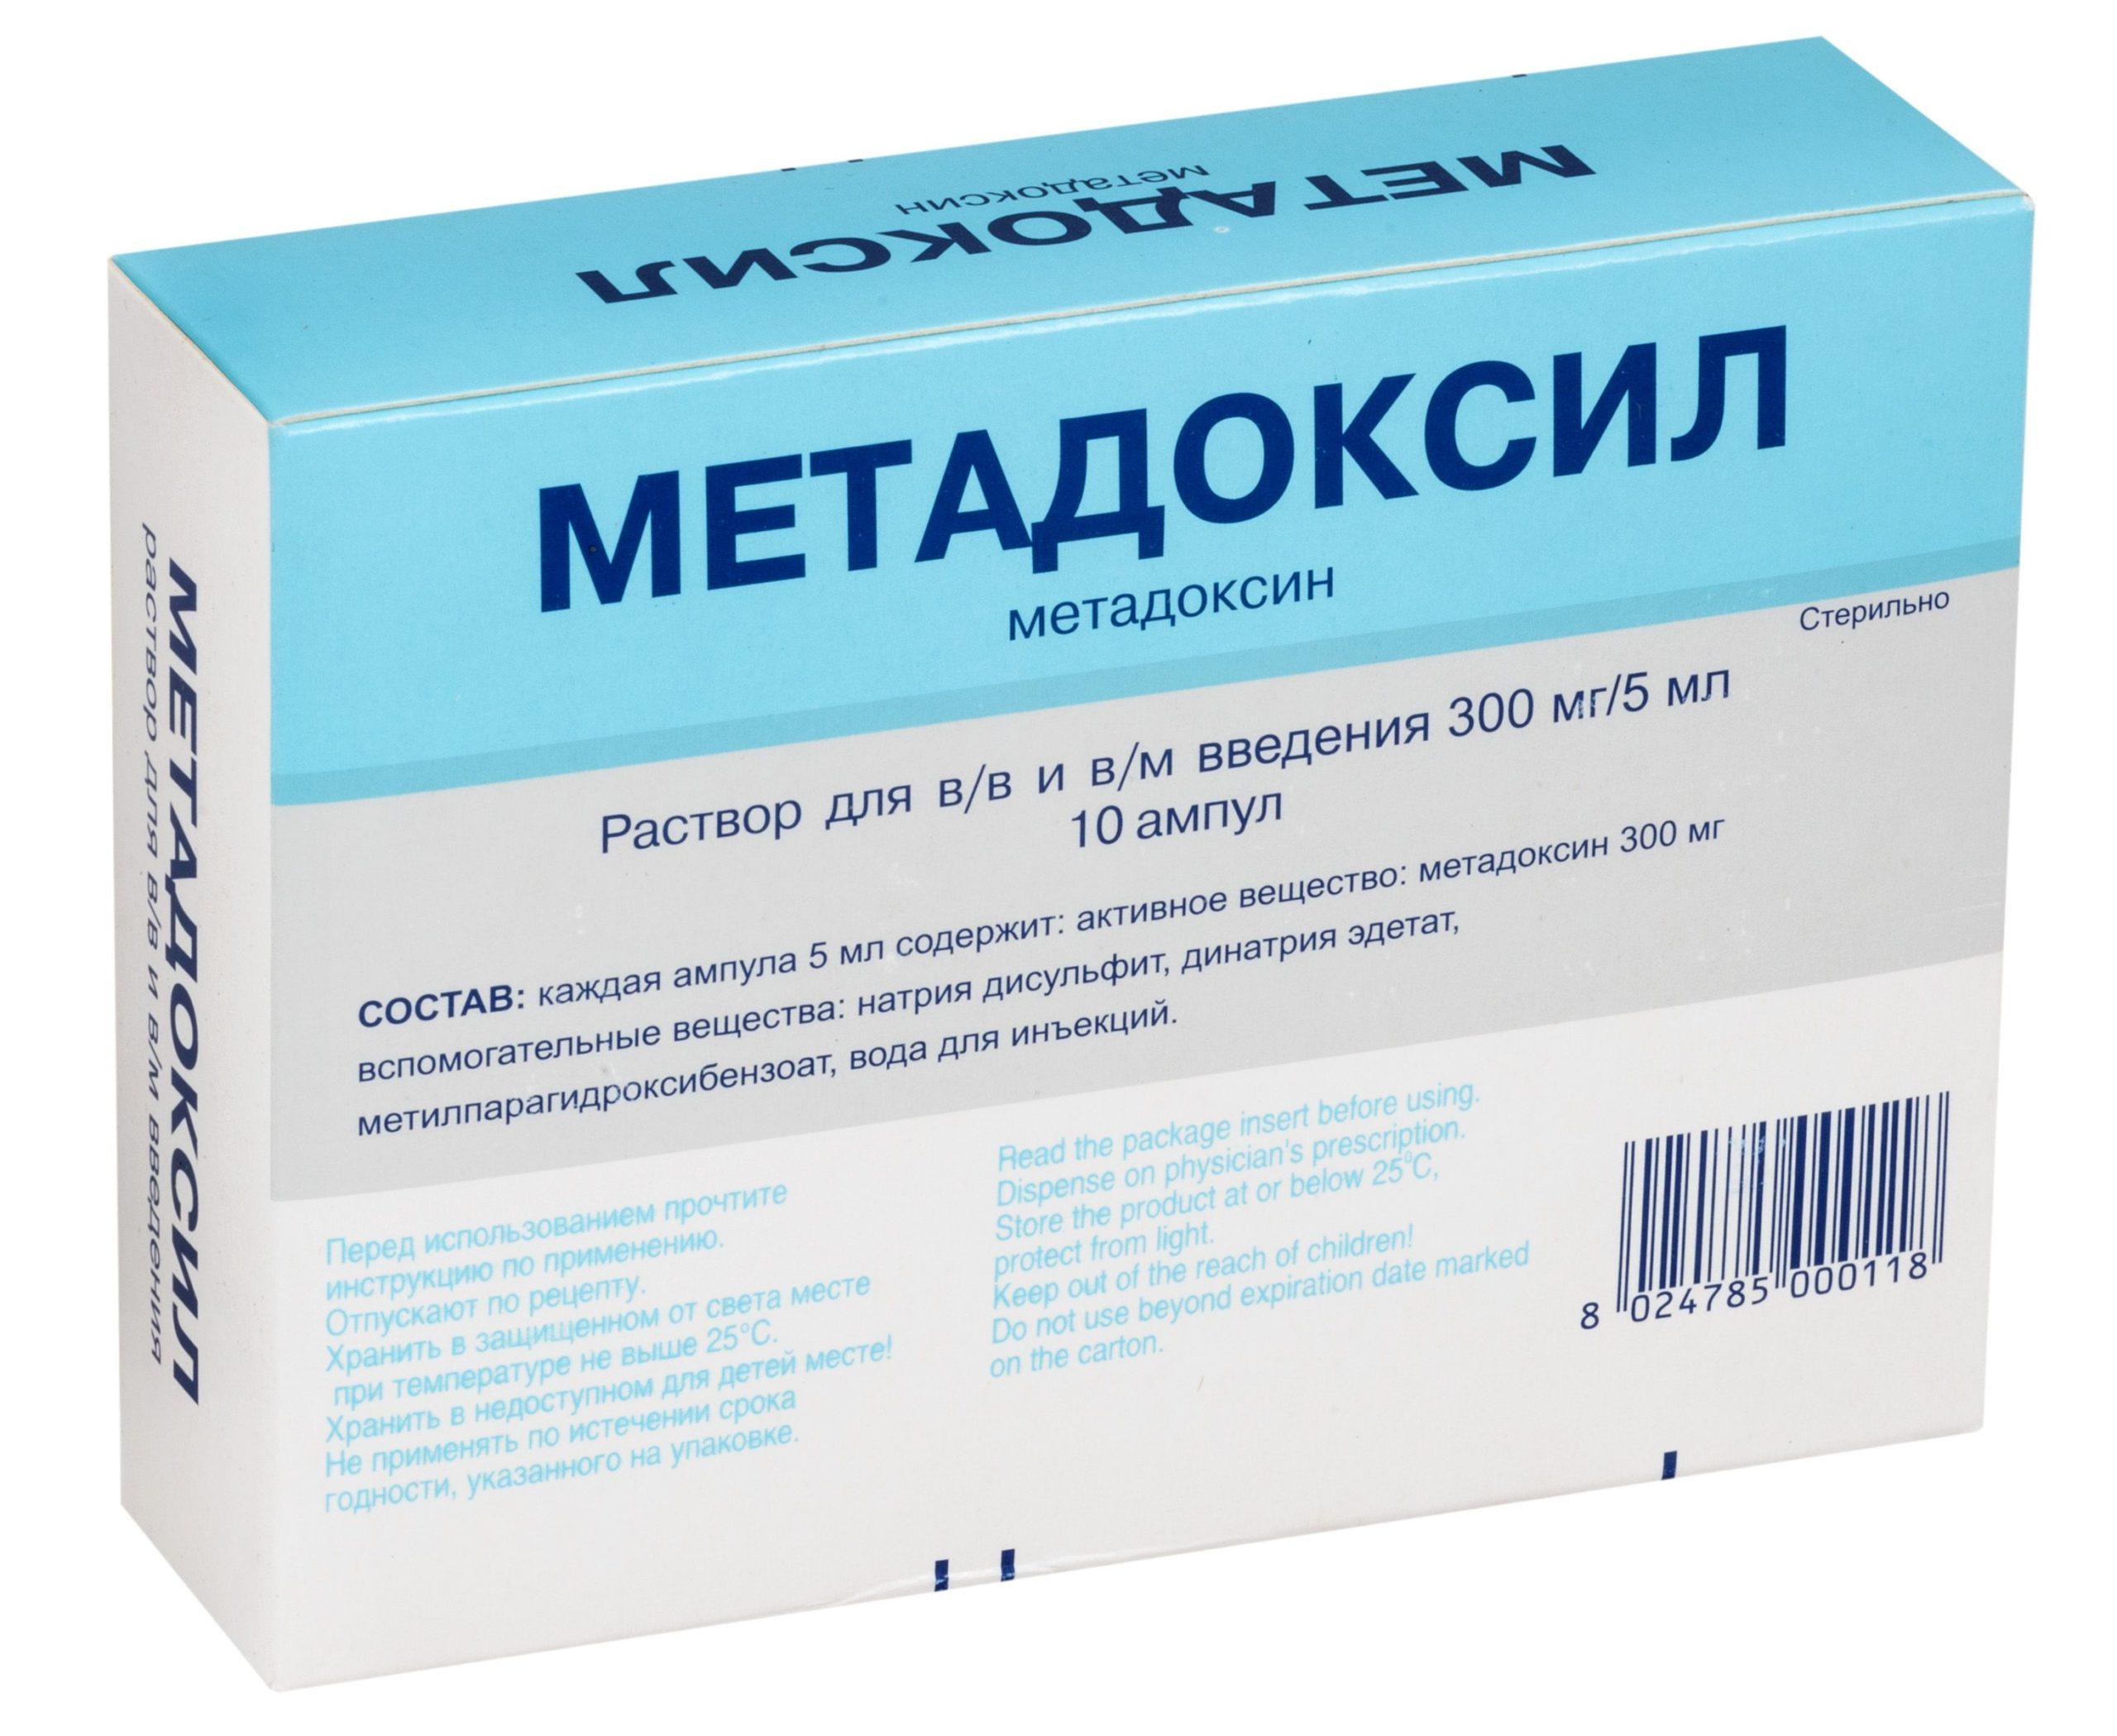 rastvor-metadoksil